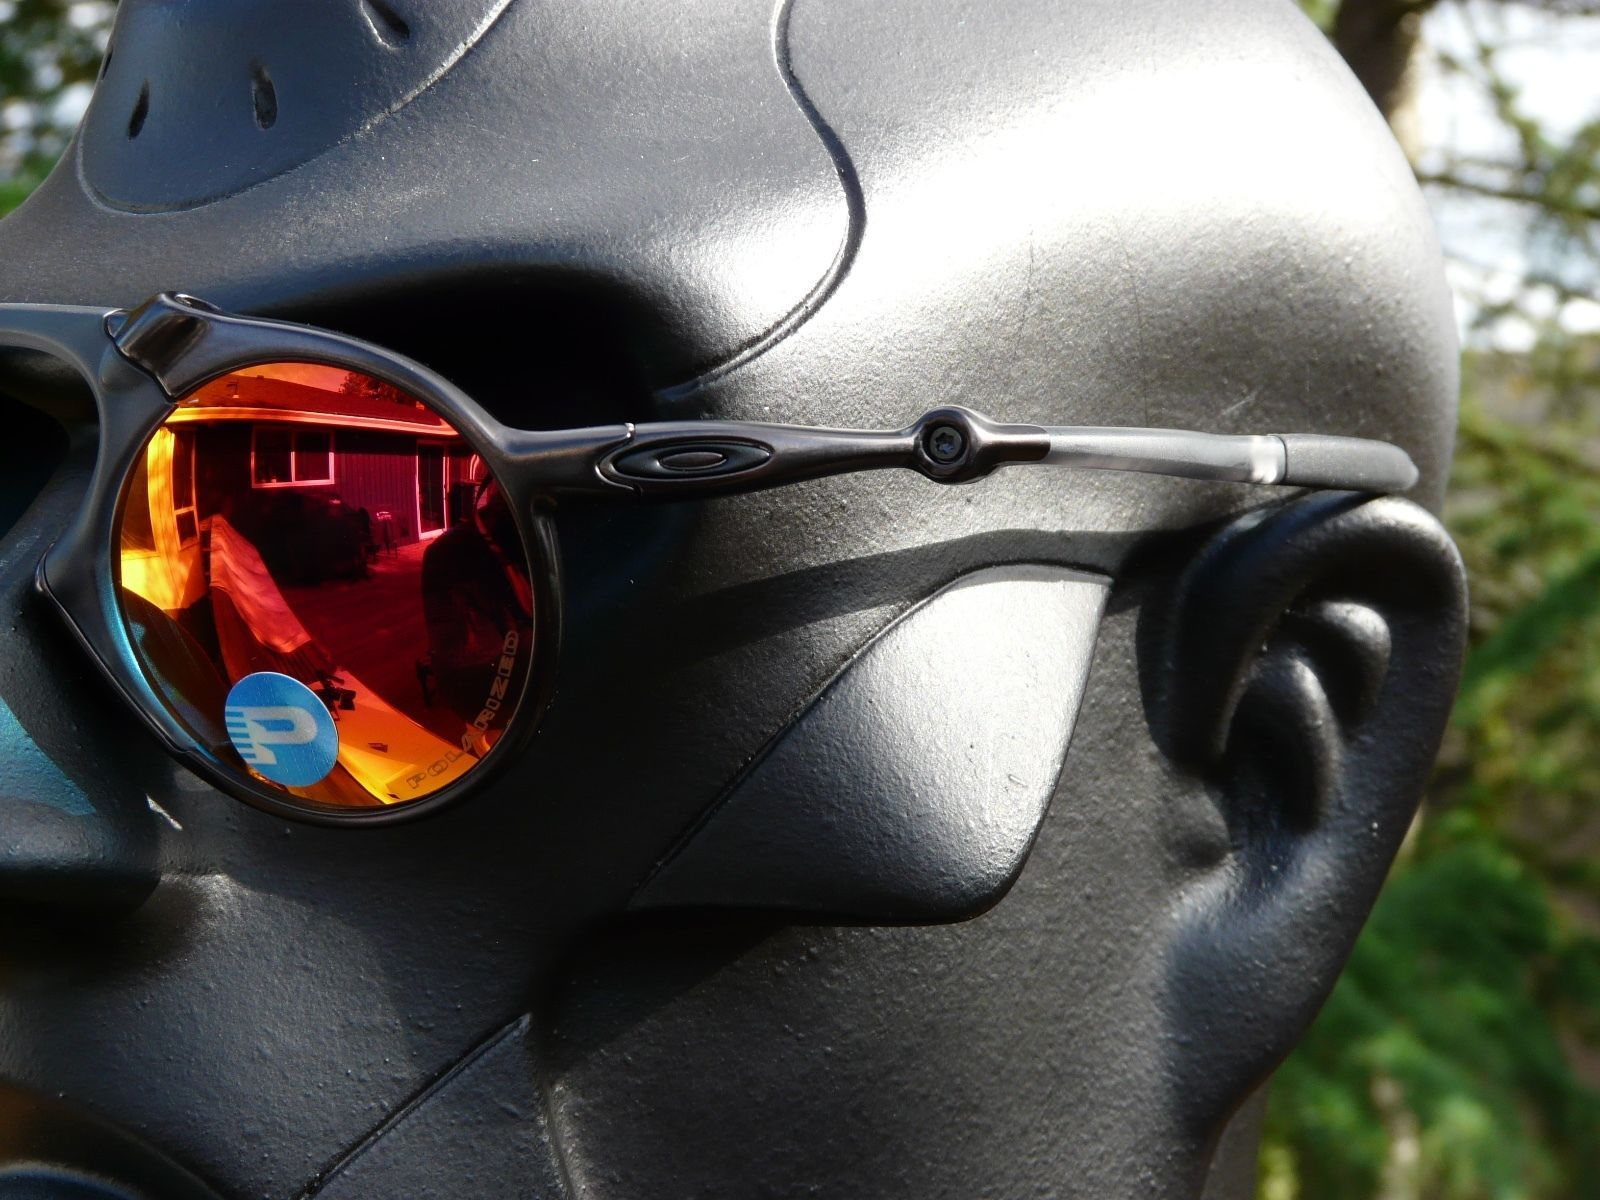 a3cce6b5422fd OAKLEY MADMAN Sunglasses Dark Carbon   Ruby Iridium Polarized OO6019-04